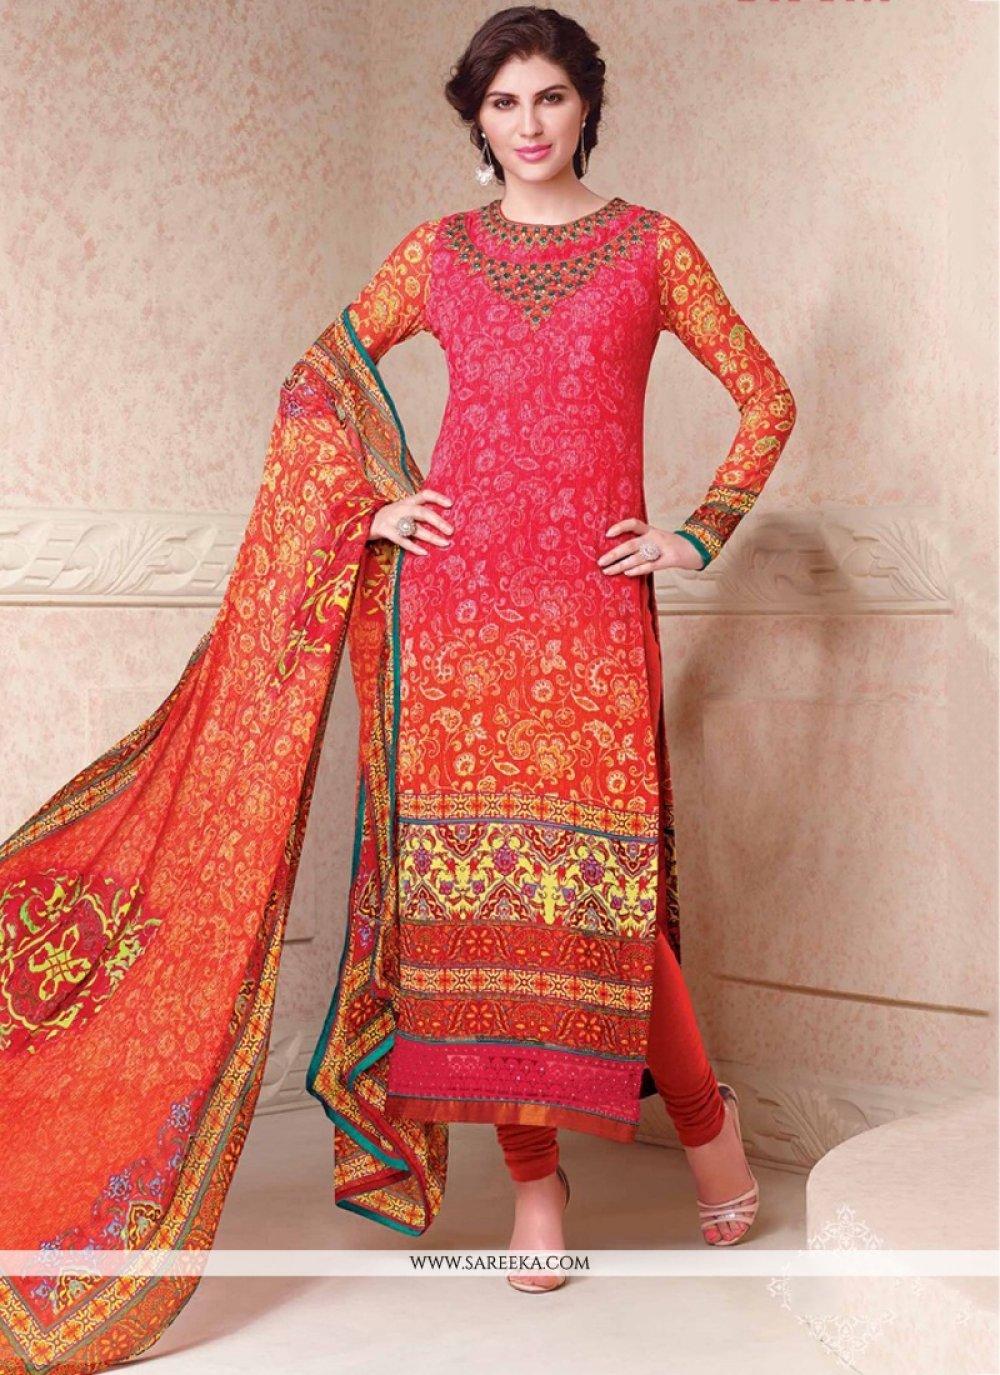 Hot Pink and Orange Churidar Designer Suit